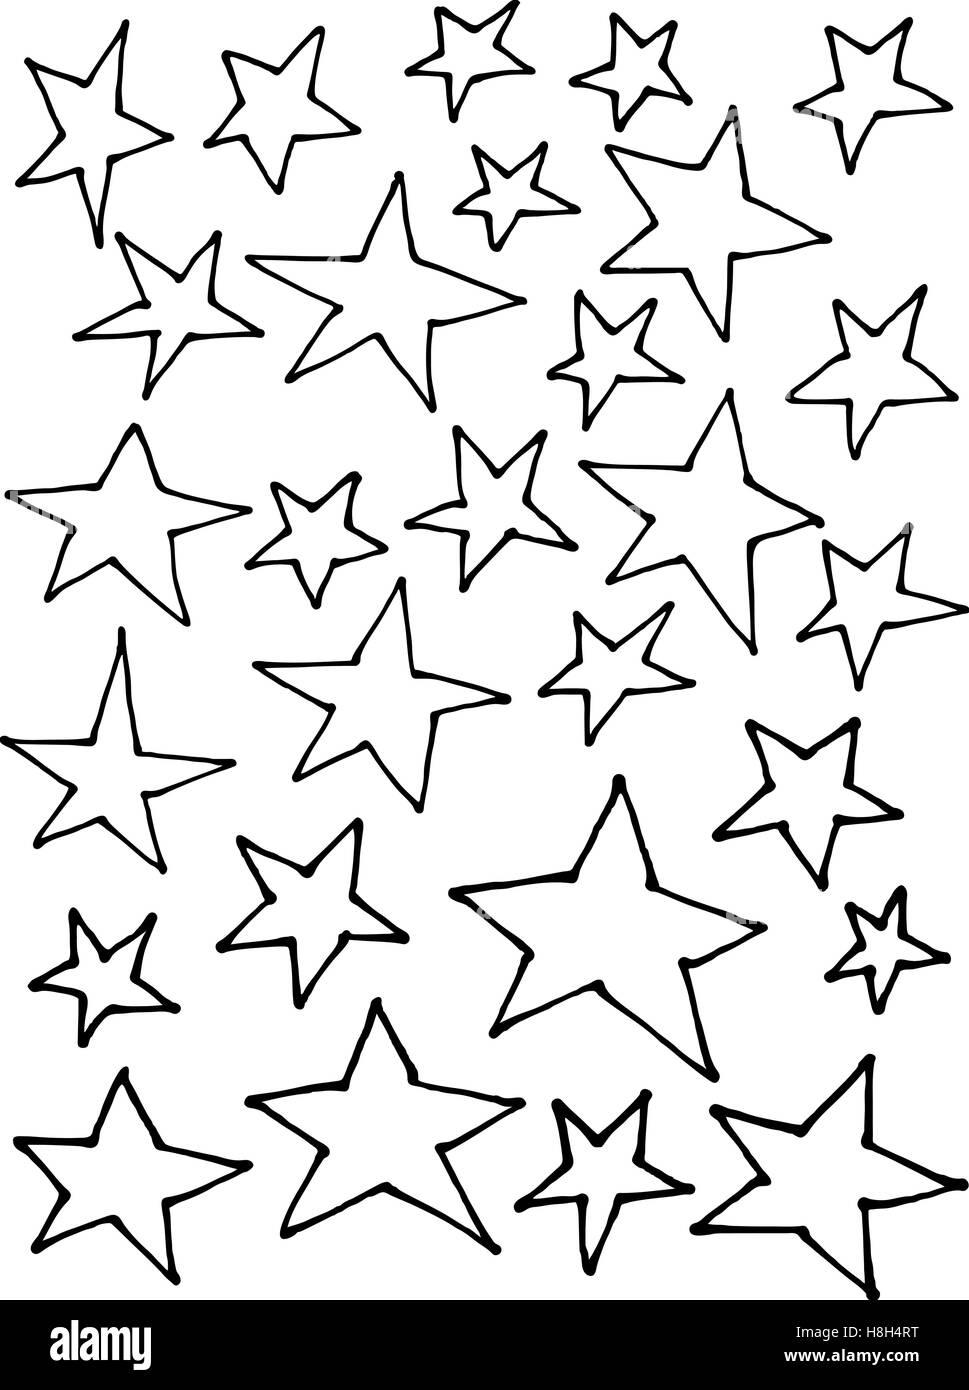 liquid line irregular stars hand drawn over white - Stock Vector